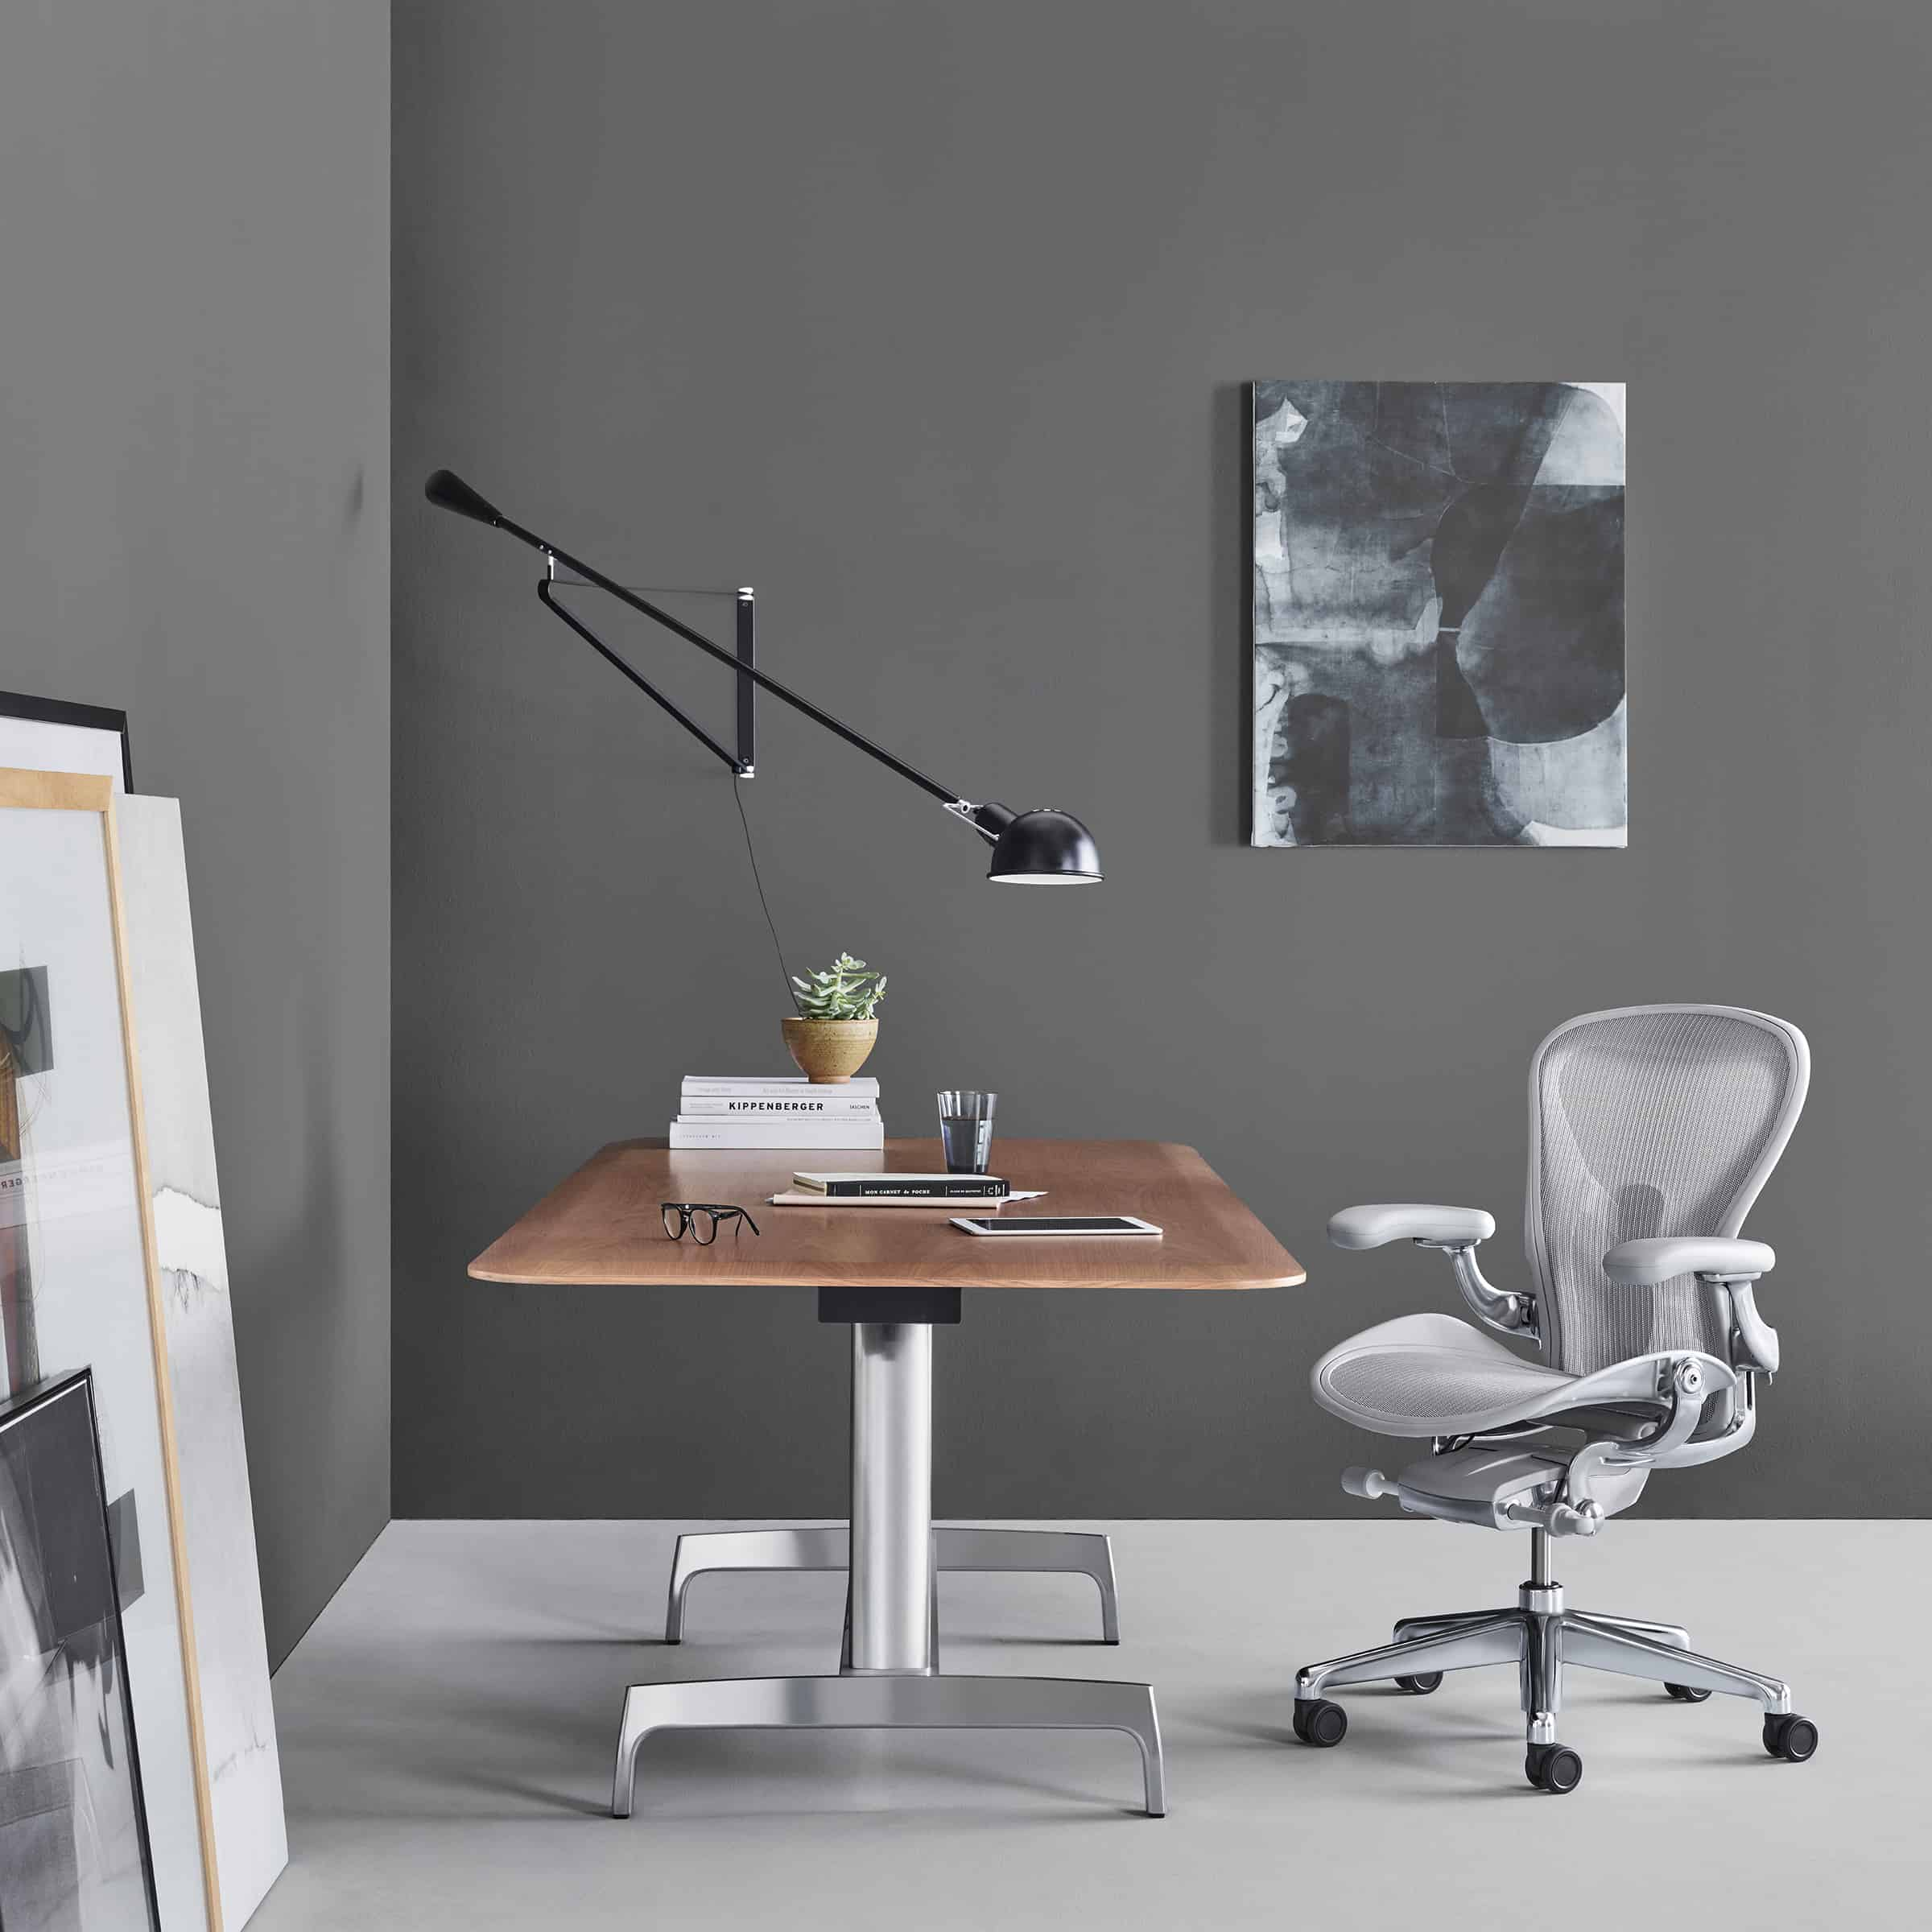 Herman Miller Aeron - Melhores Cadeiras de Escritório do Mercado